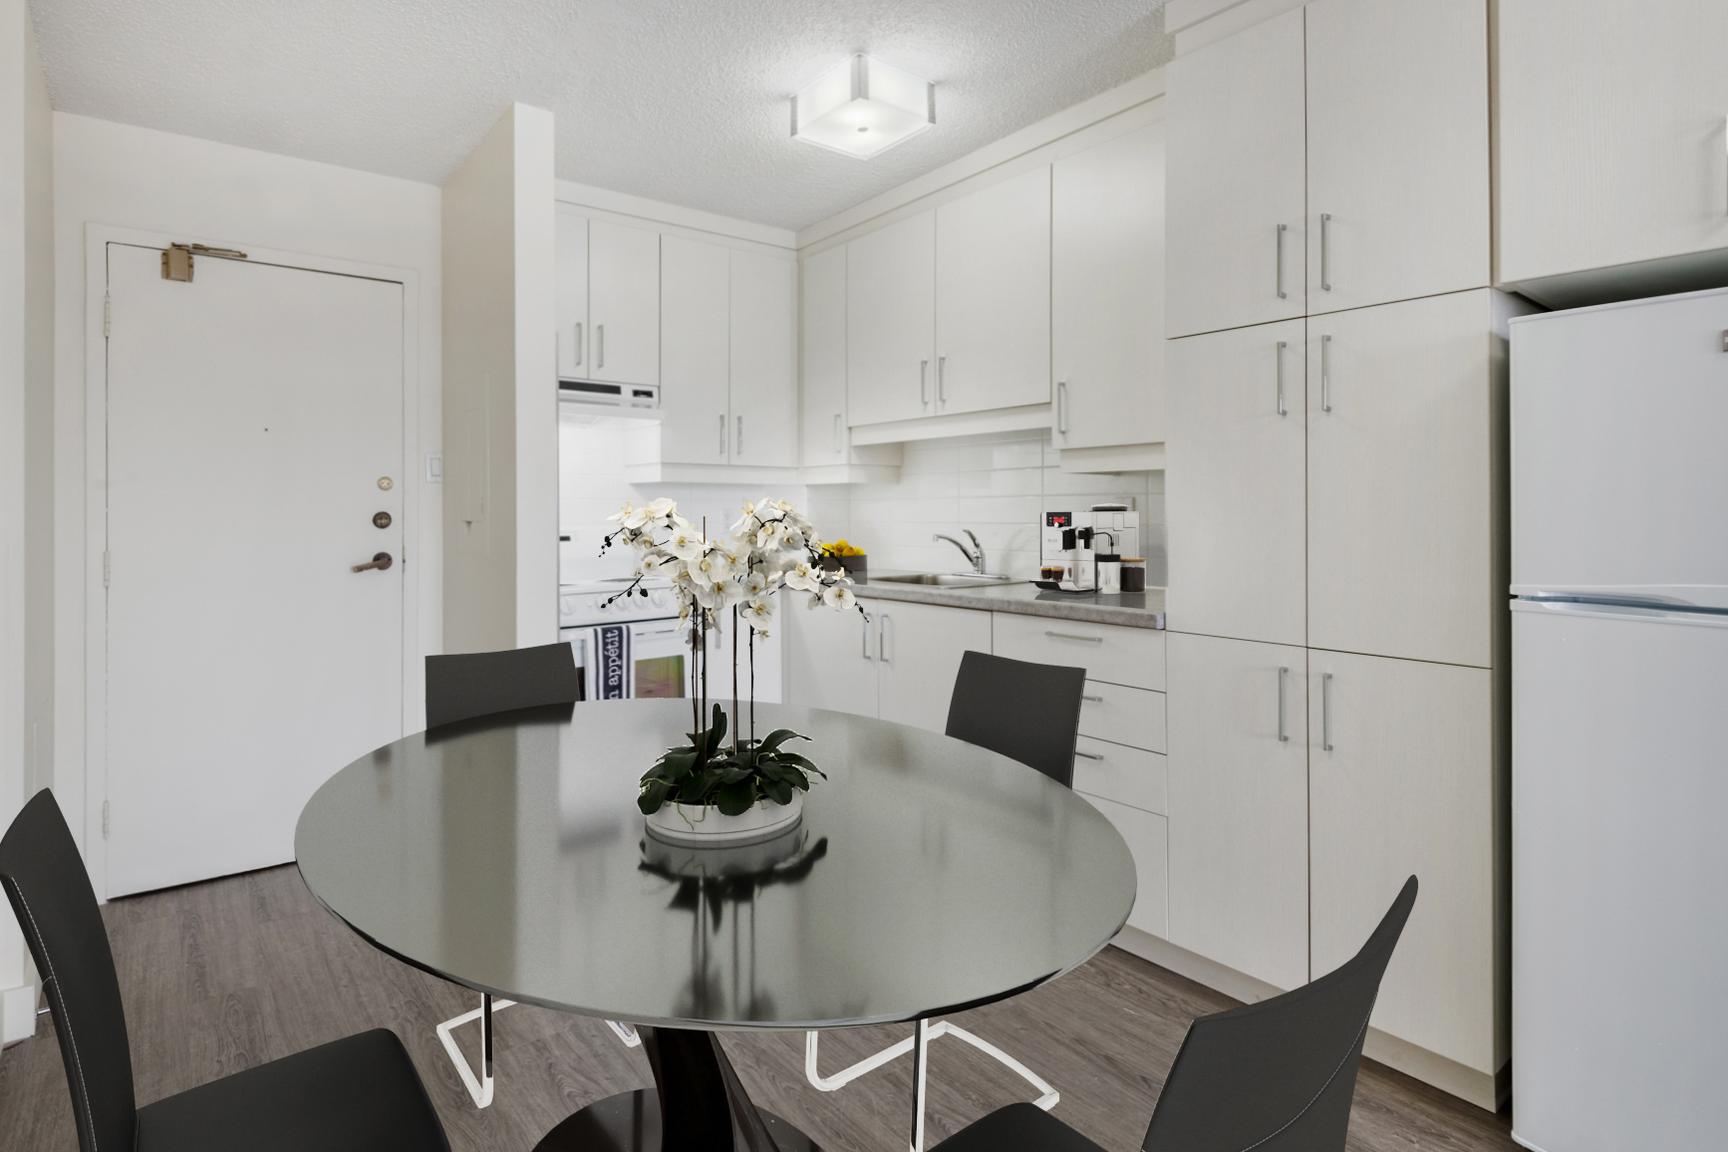 1 bedroom Apartments for rent in Laval at Le Quatre Cent - Photo 12 - RentersPages – L407183